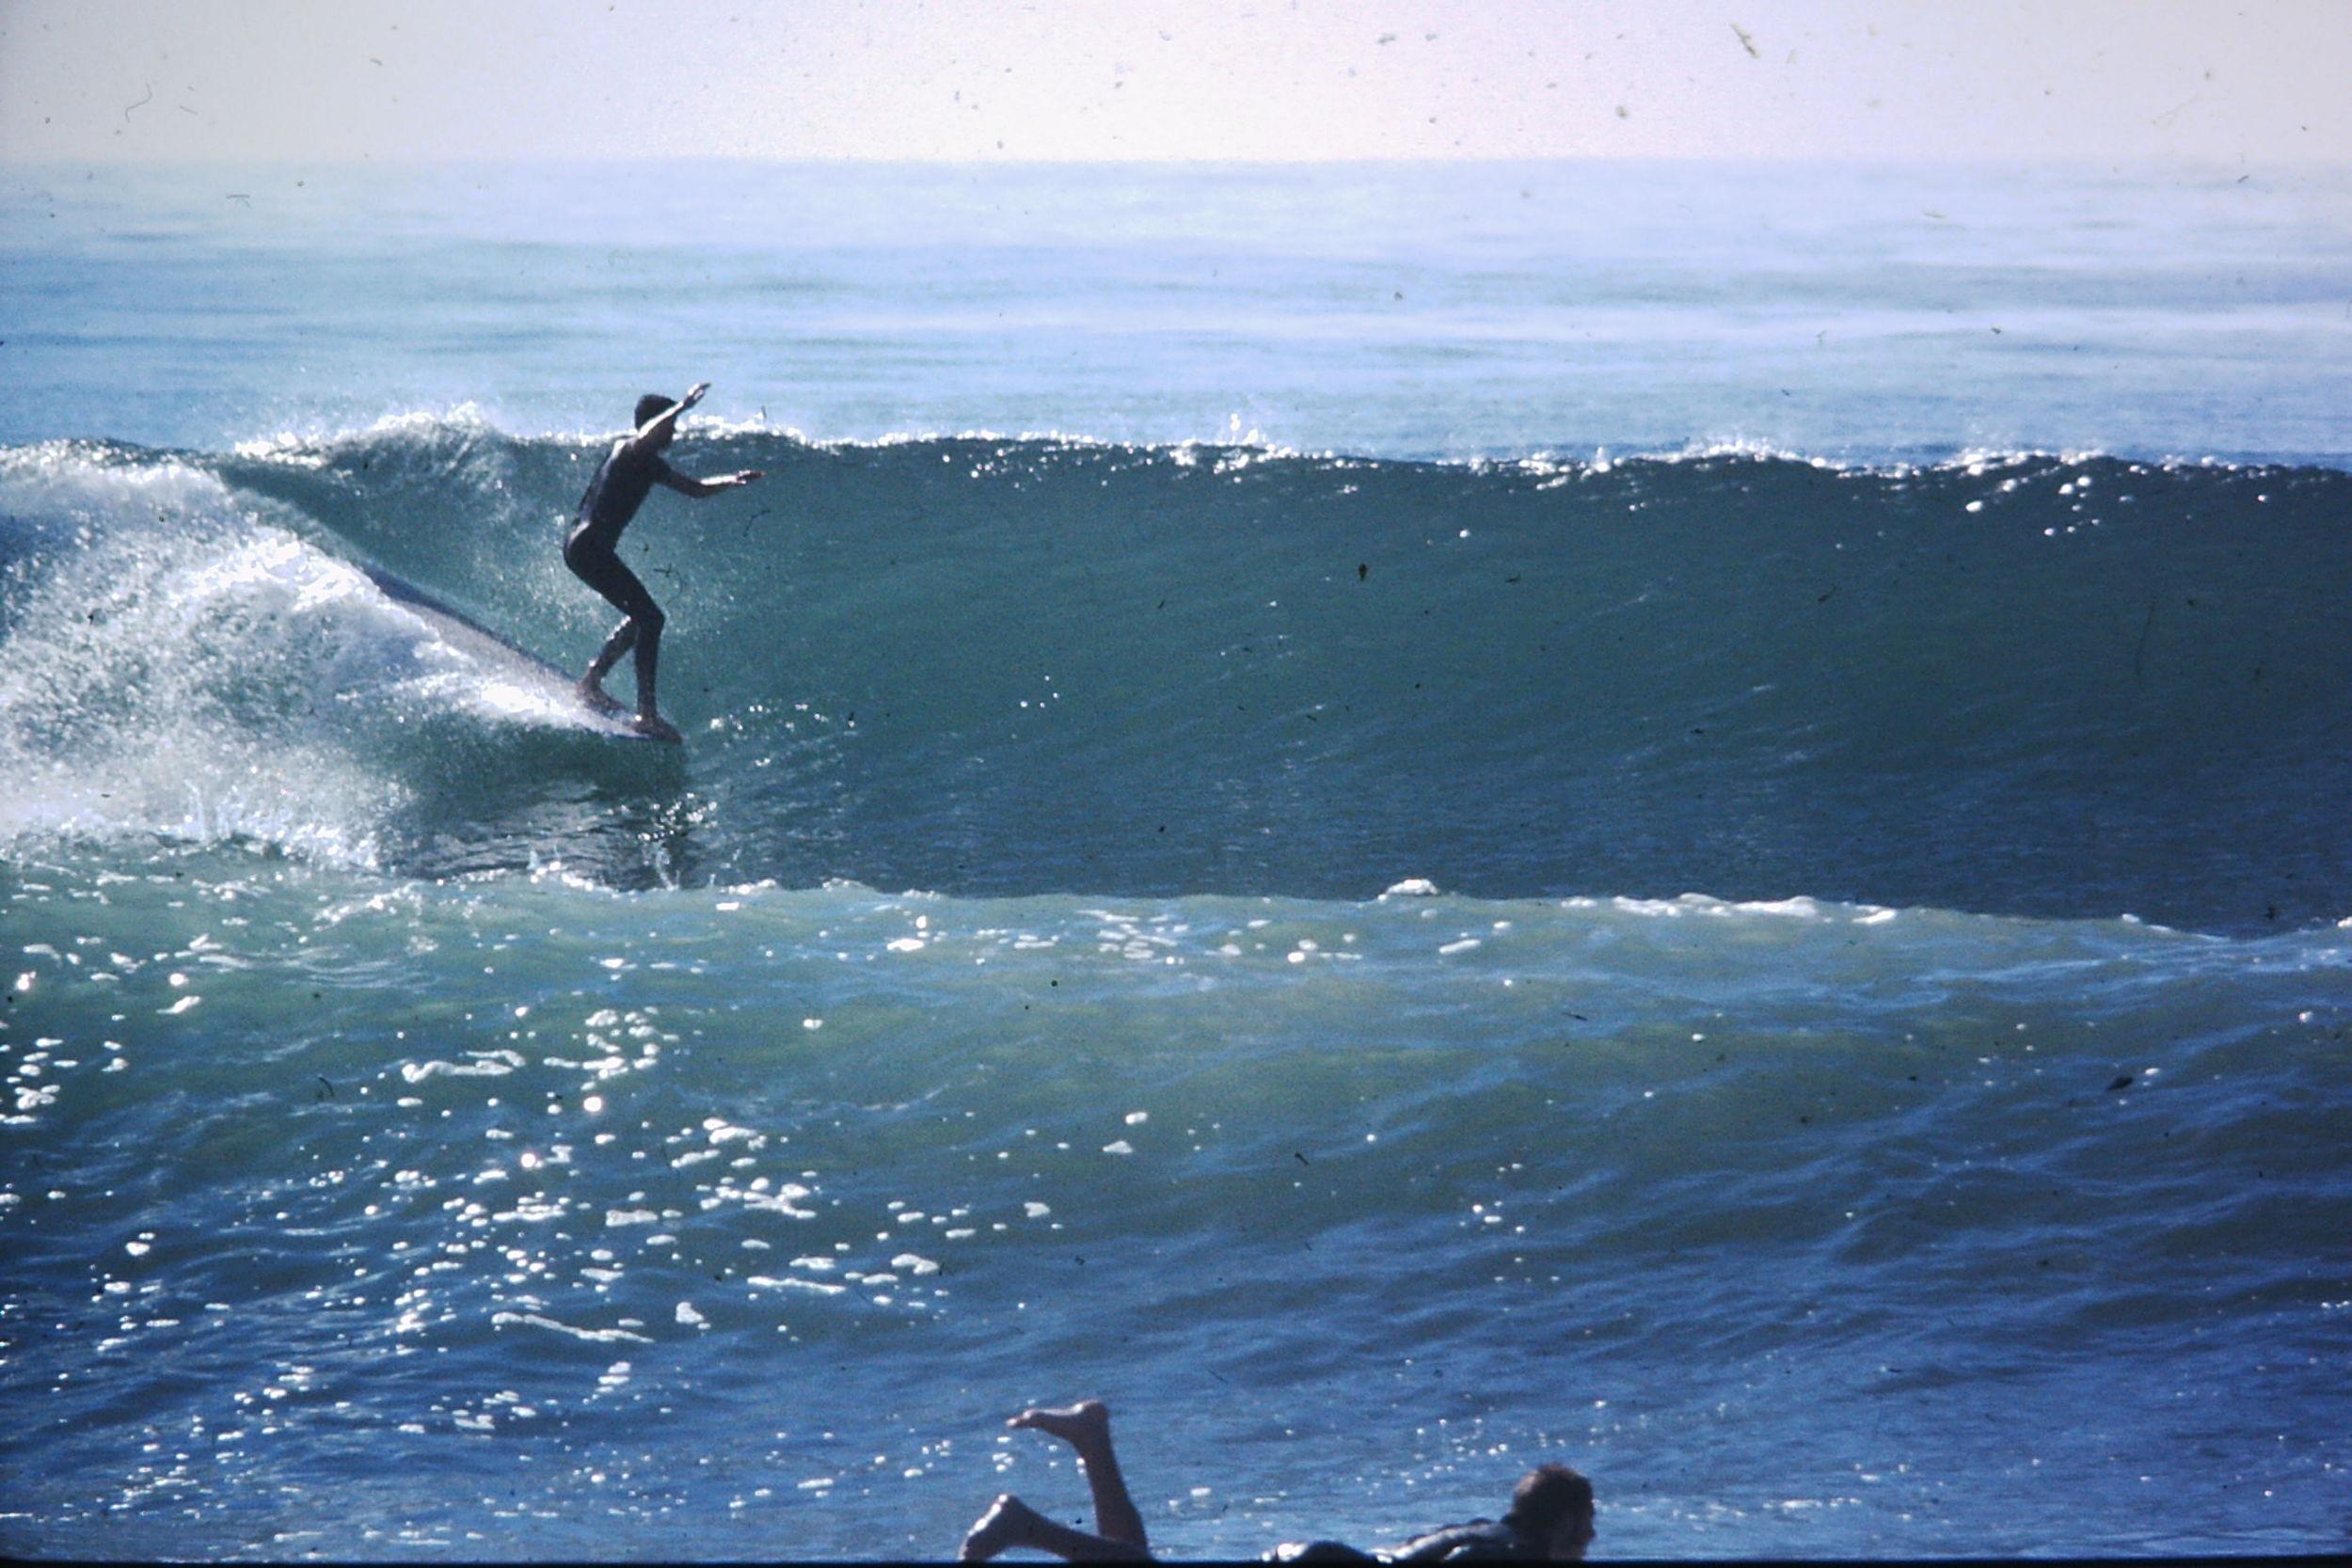 bruce_jones_surfboards_6.JPG